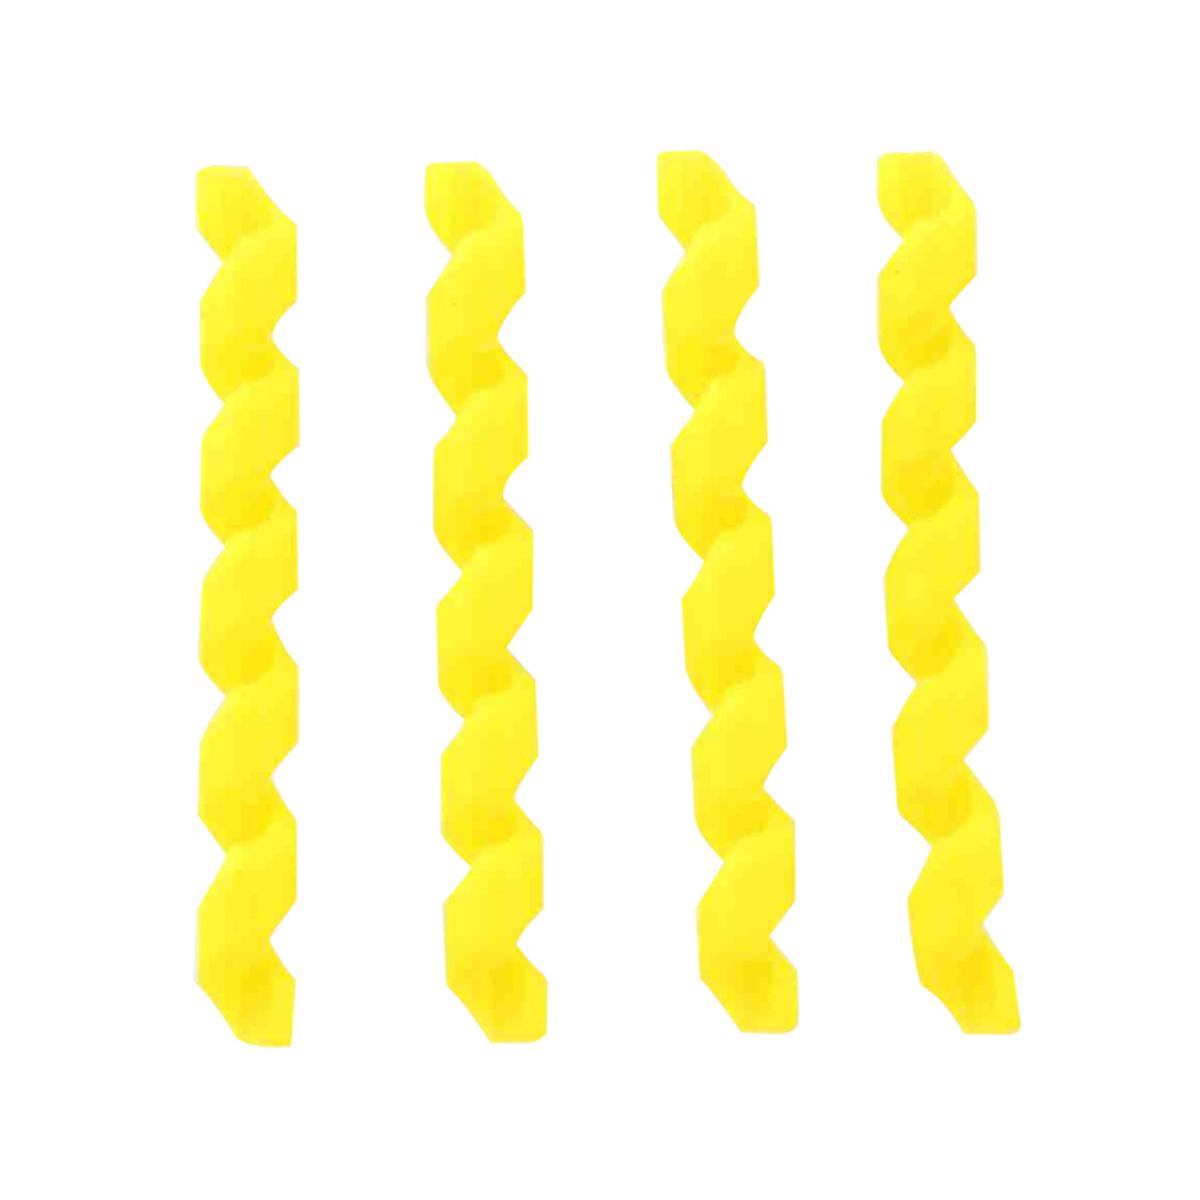 NOGUCHI(ノグチ)フレームプロテクター 蛍光イエロー